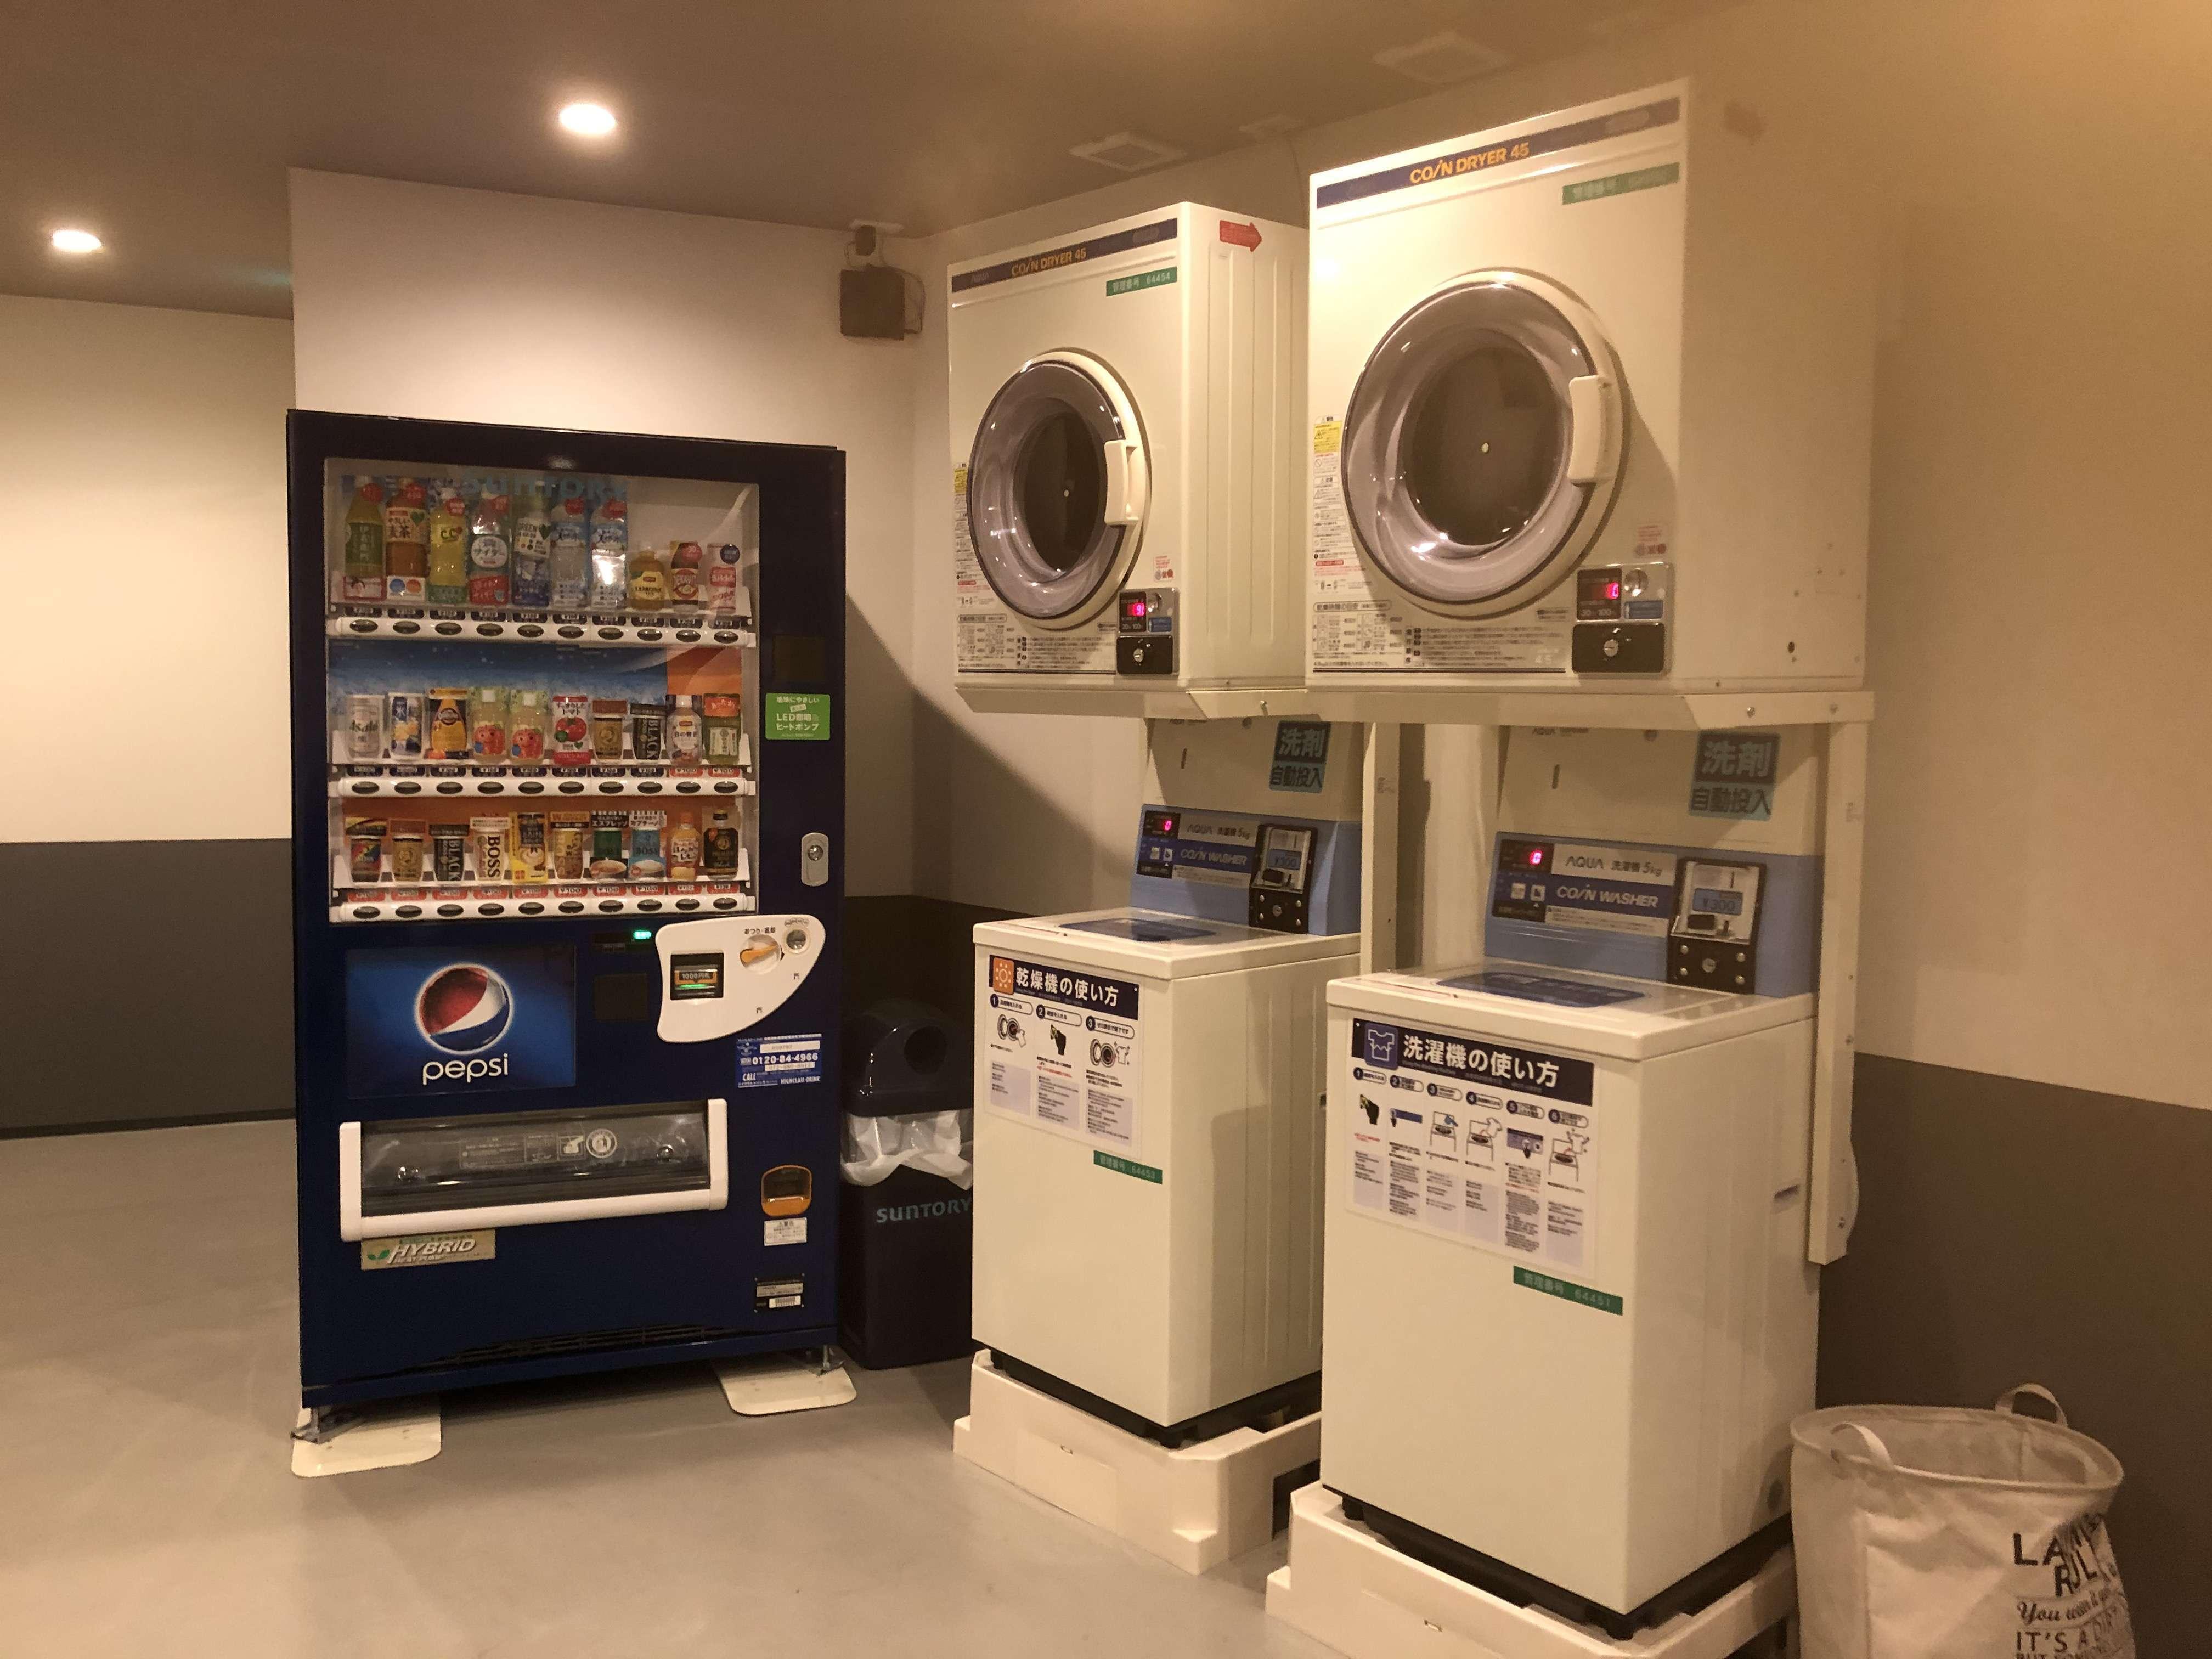 Takuto Stay Kyobashi Tsumiki ドミトリー_ホテル_洗濯機・乾燥機